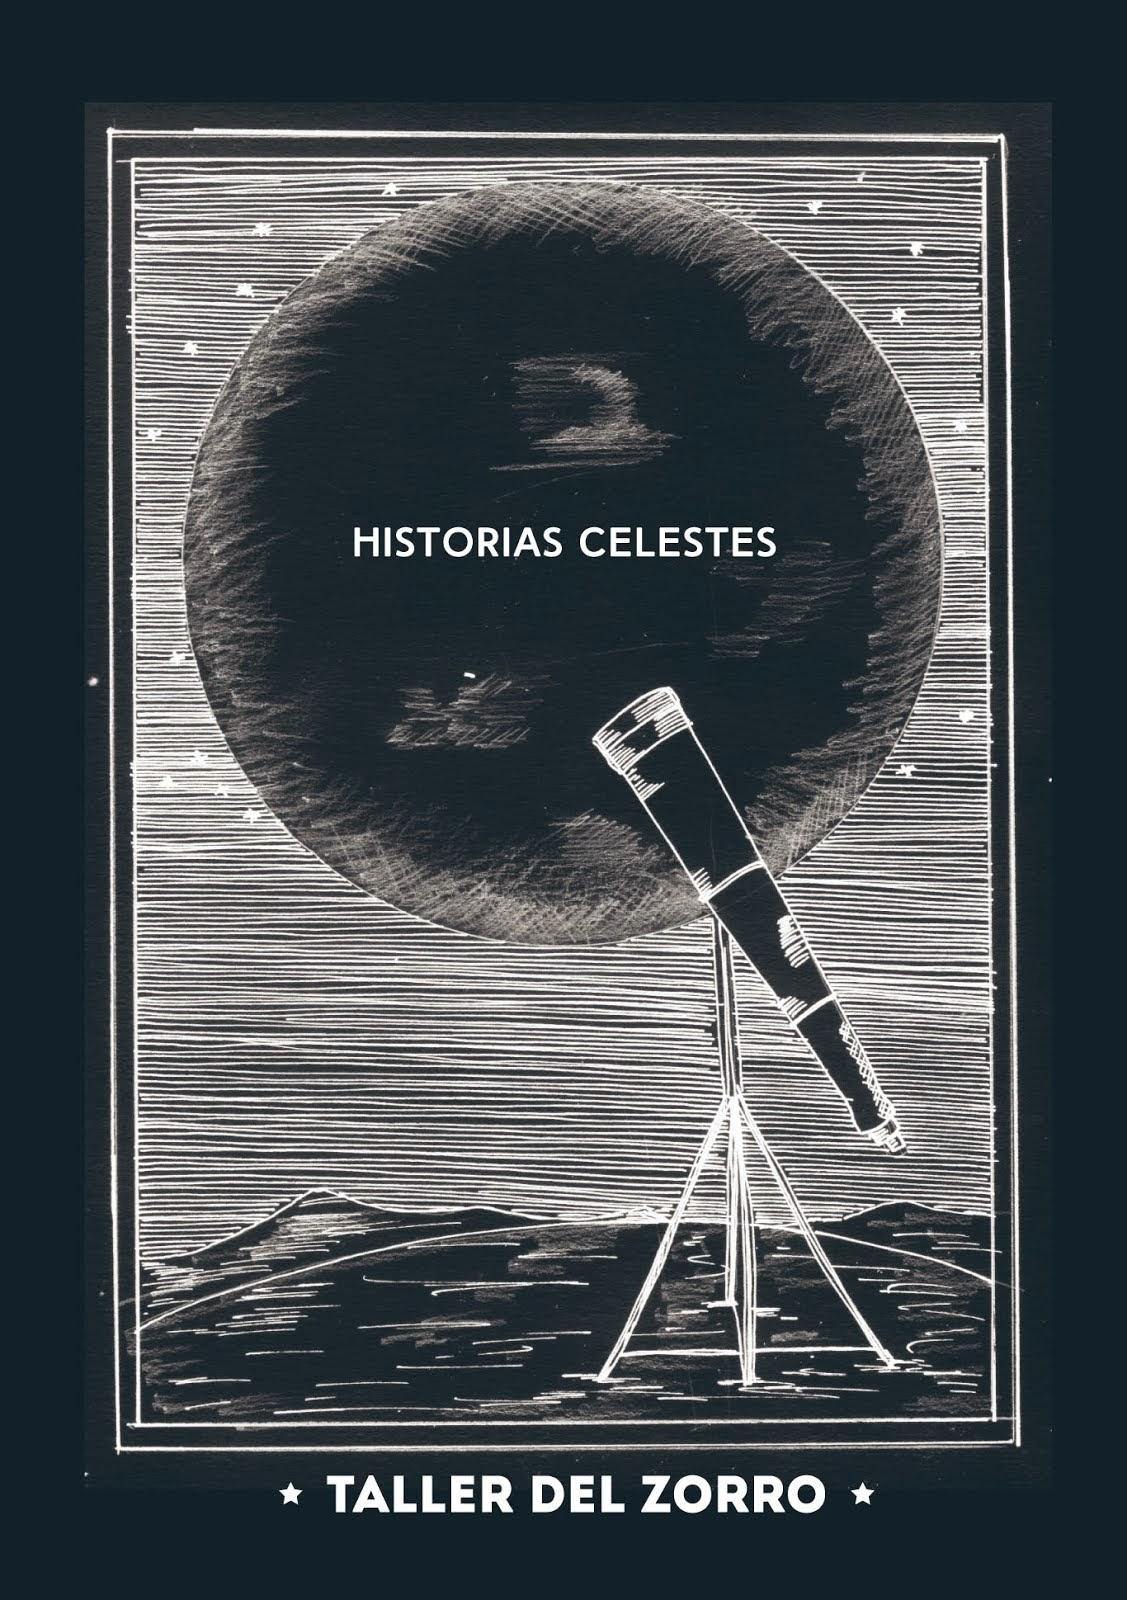 HISTORIAS CELESTES